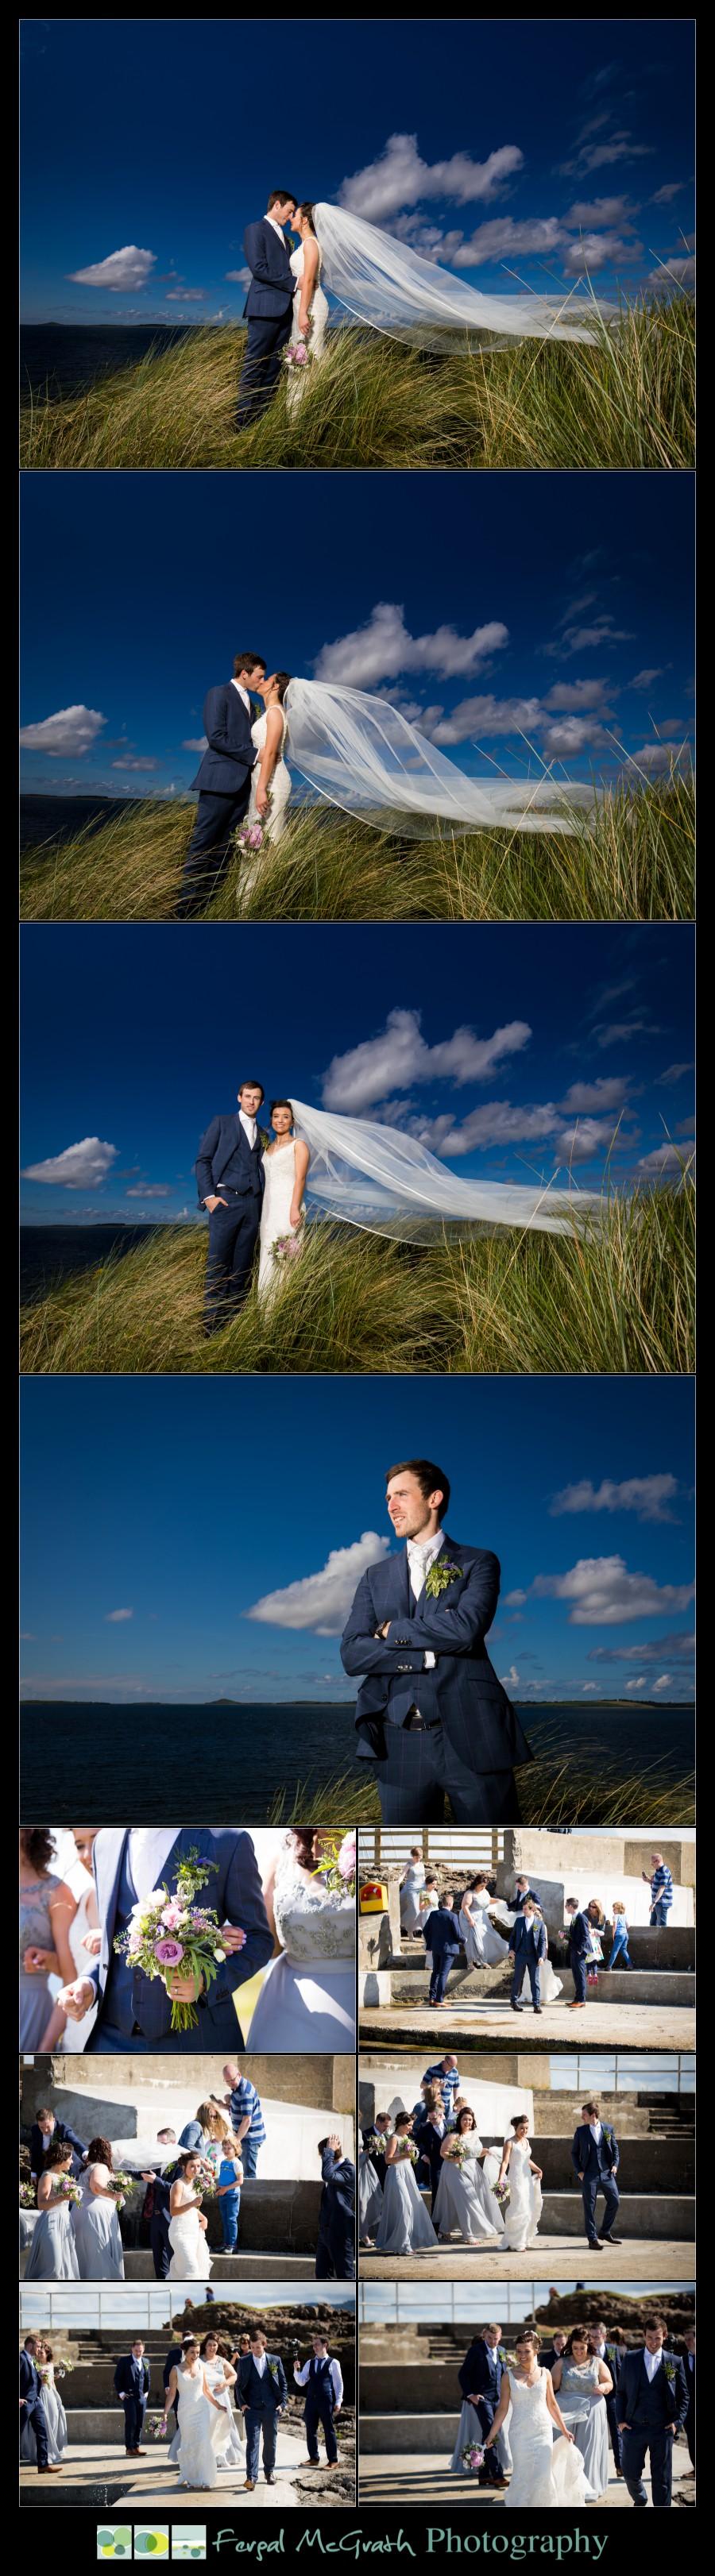 Clayton Hotel Sligo Wedding photos at rosses point beach